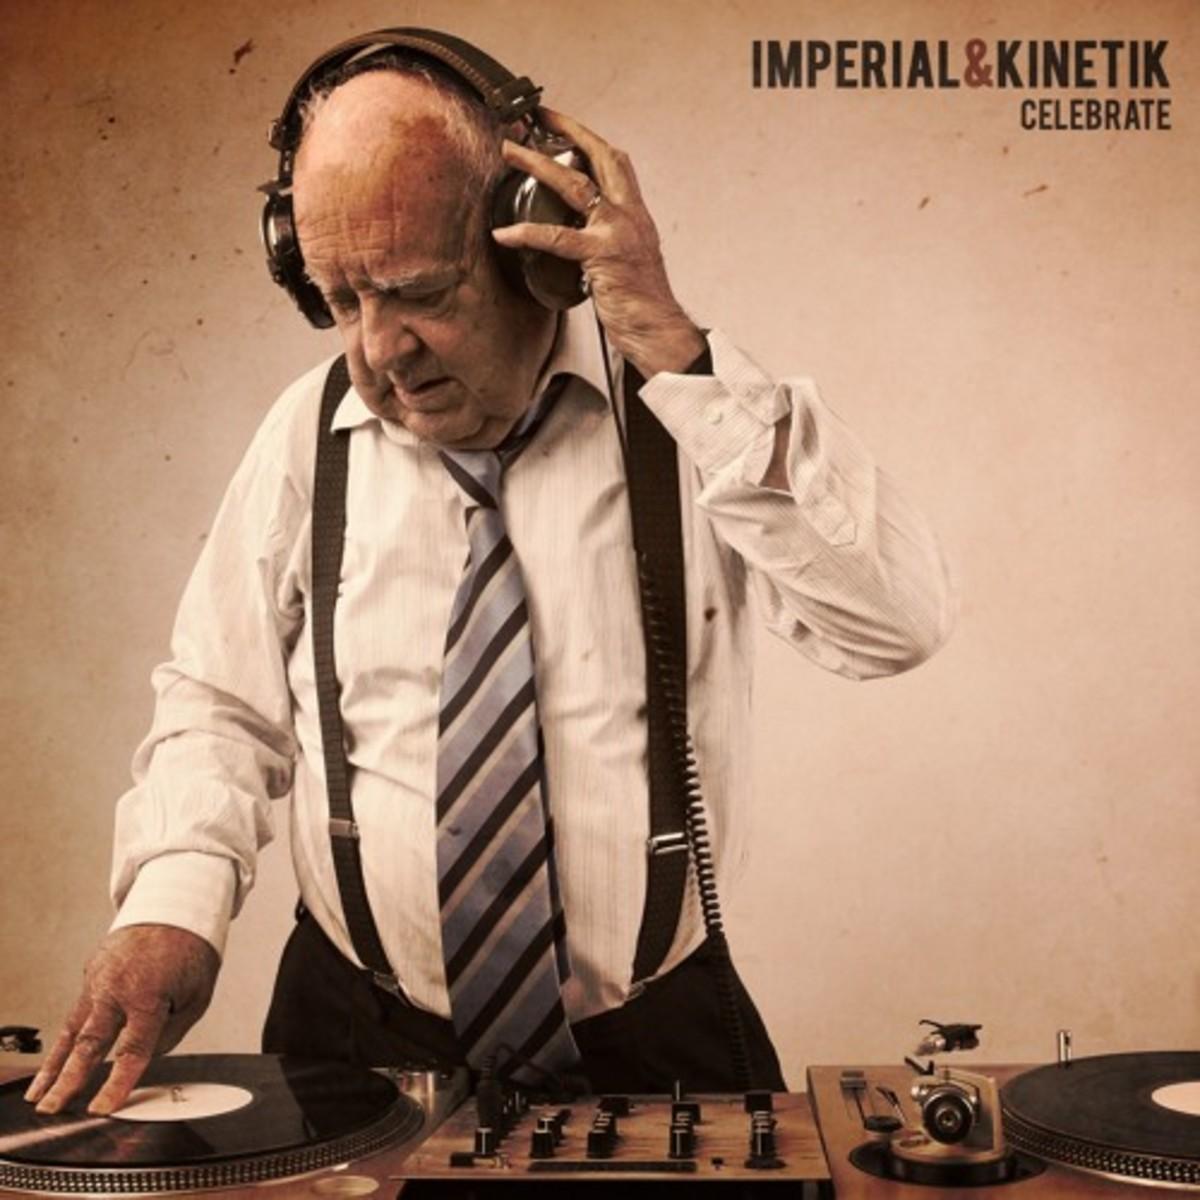 imperial-kinetik-celebrate.jpg